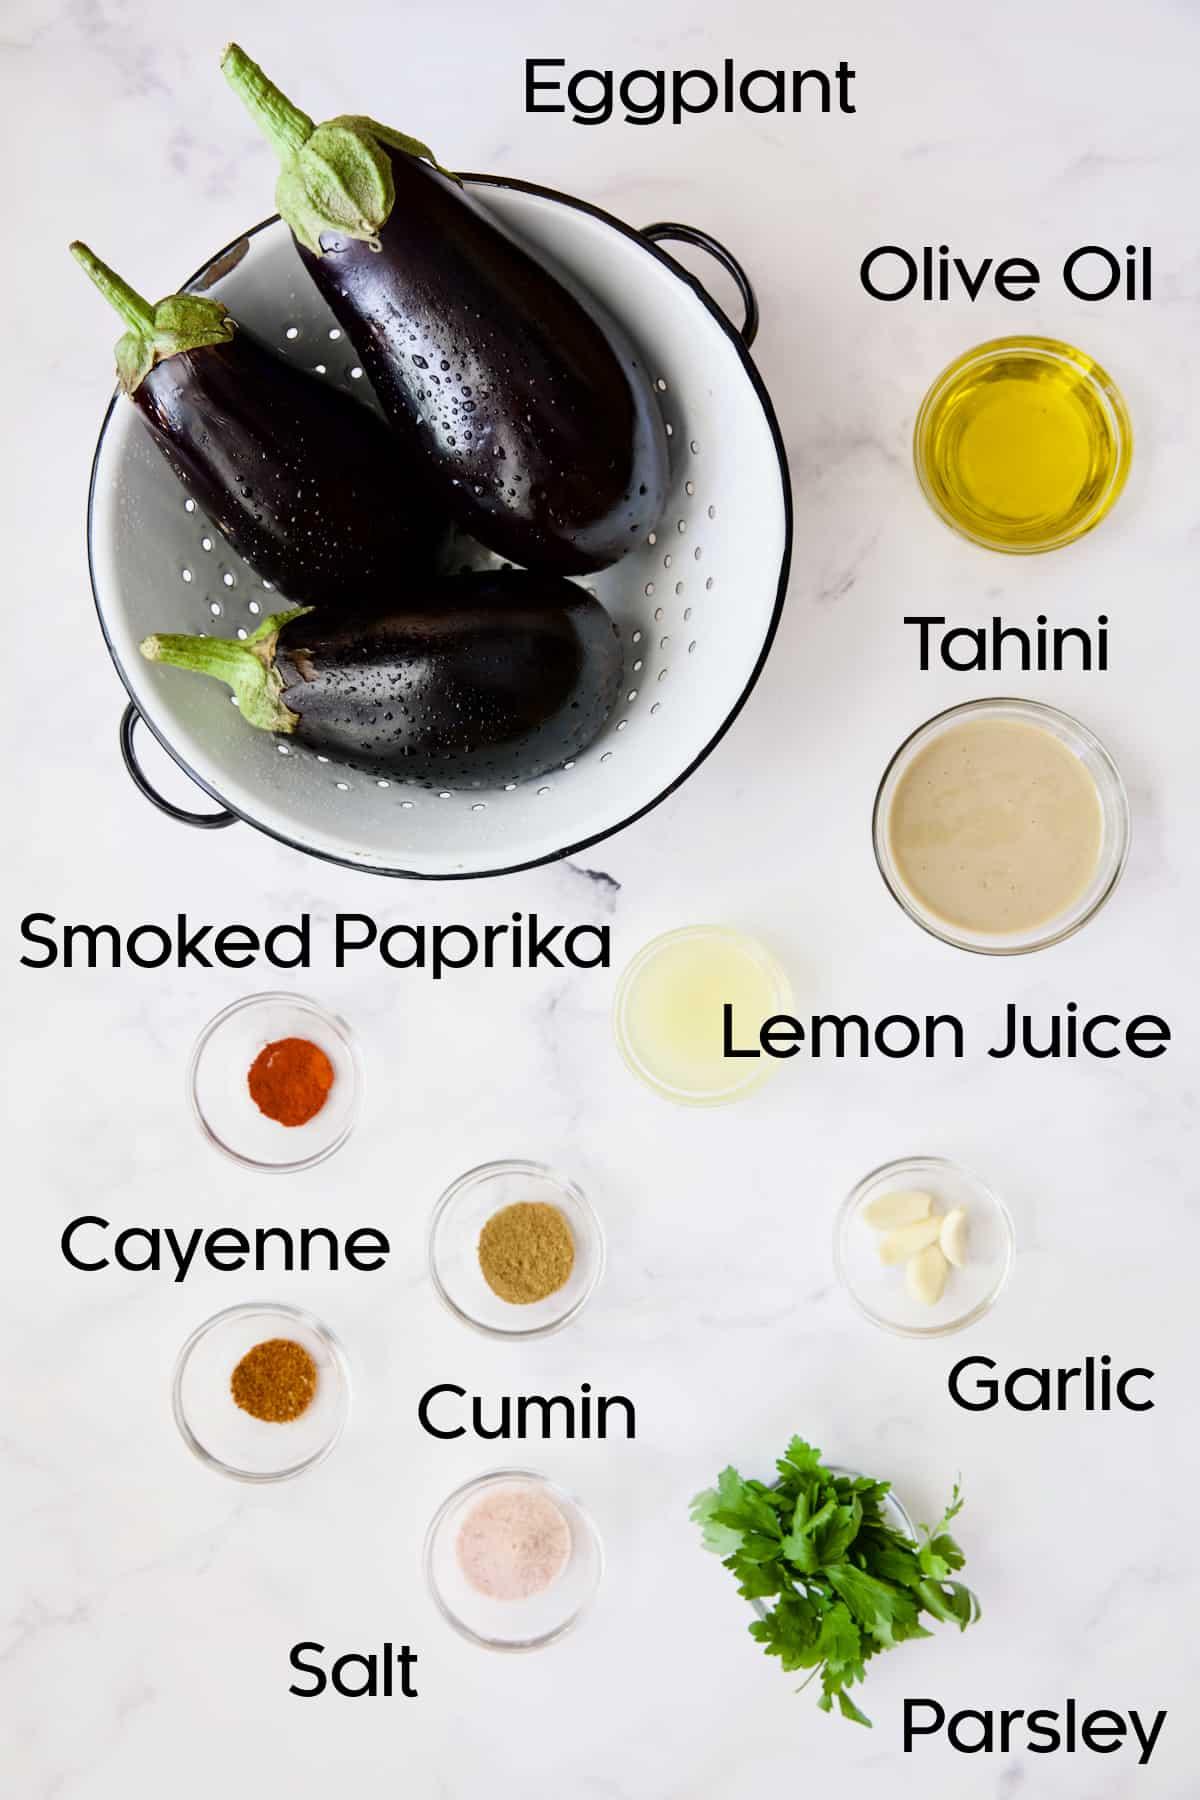 Ingredients for Loaded Roasted Eggplant Dip (Baba Ganoush).